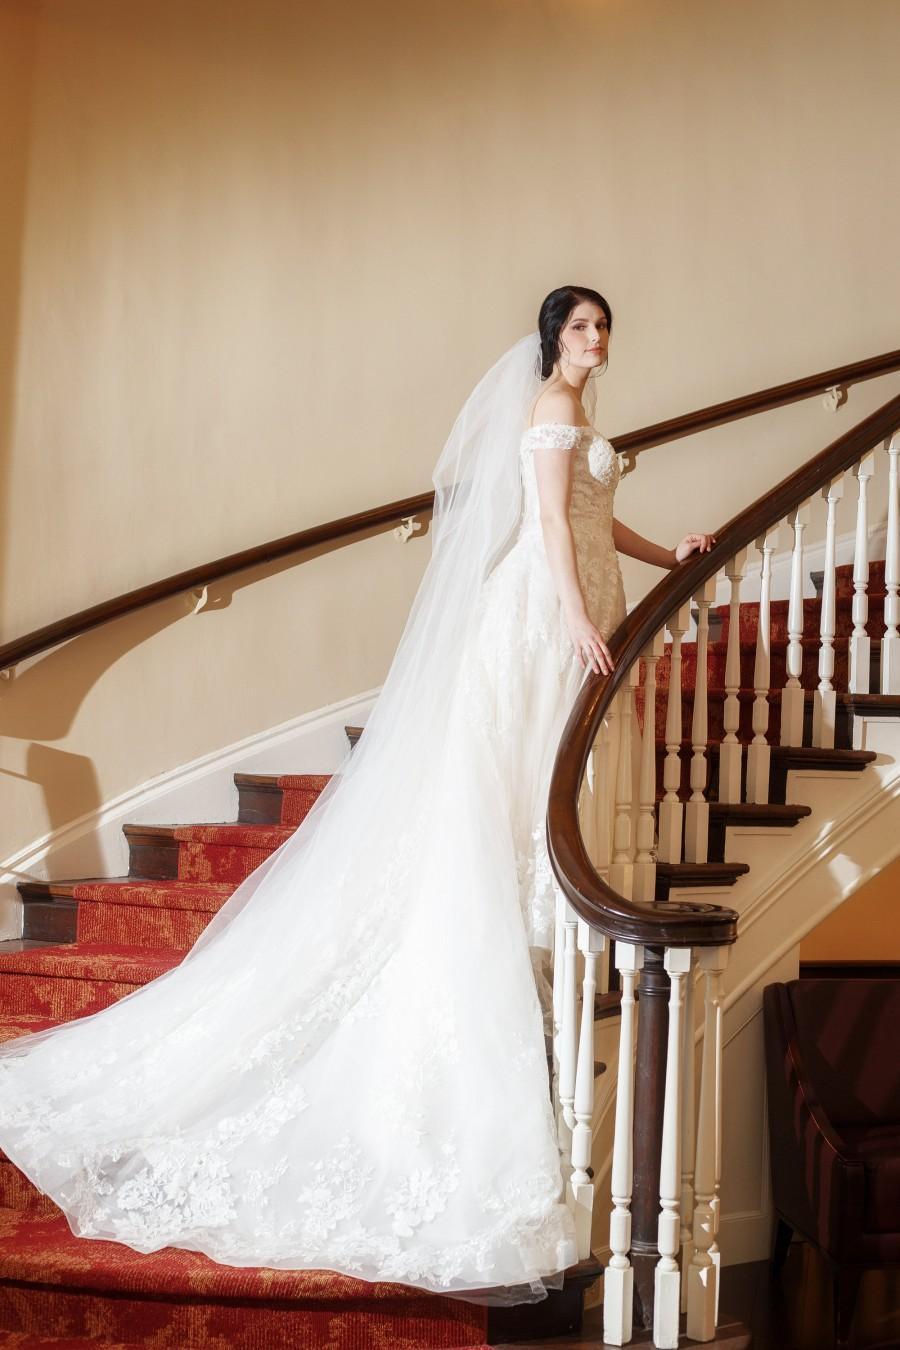 Wedding - 2 Tier Cathedral Wedding Veil, Veil with Blusher, Two Tier Veil, Raw Edge, Full Bridal Veil, Cut Edge Veil, White Ivory Wedding Veil